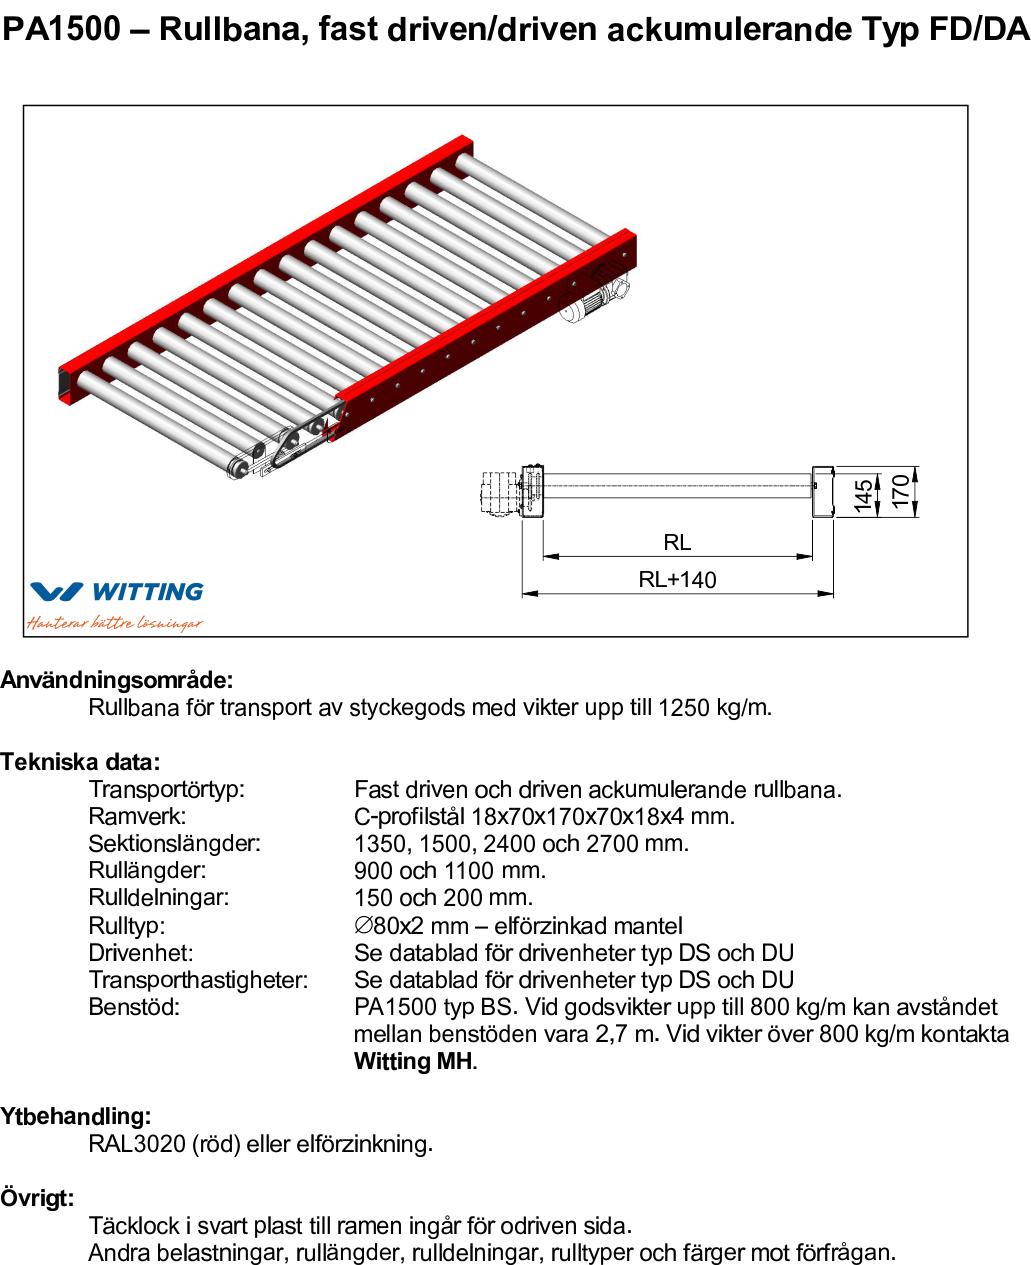 PA1500 – Rullbana, fast driven_driven ackumulerande Typ FD_DA